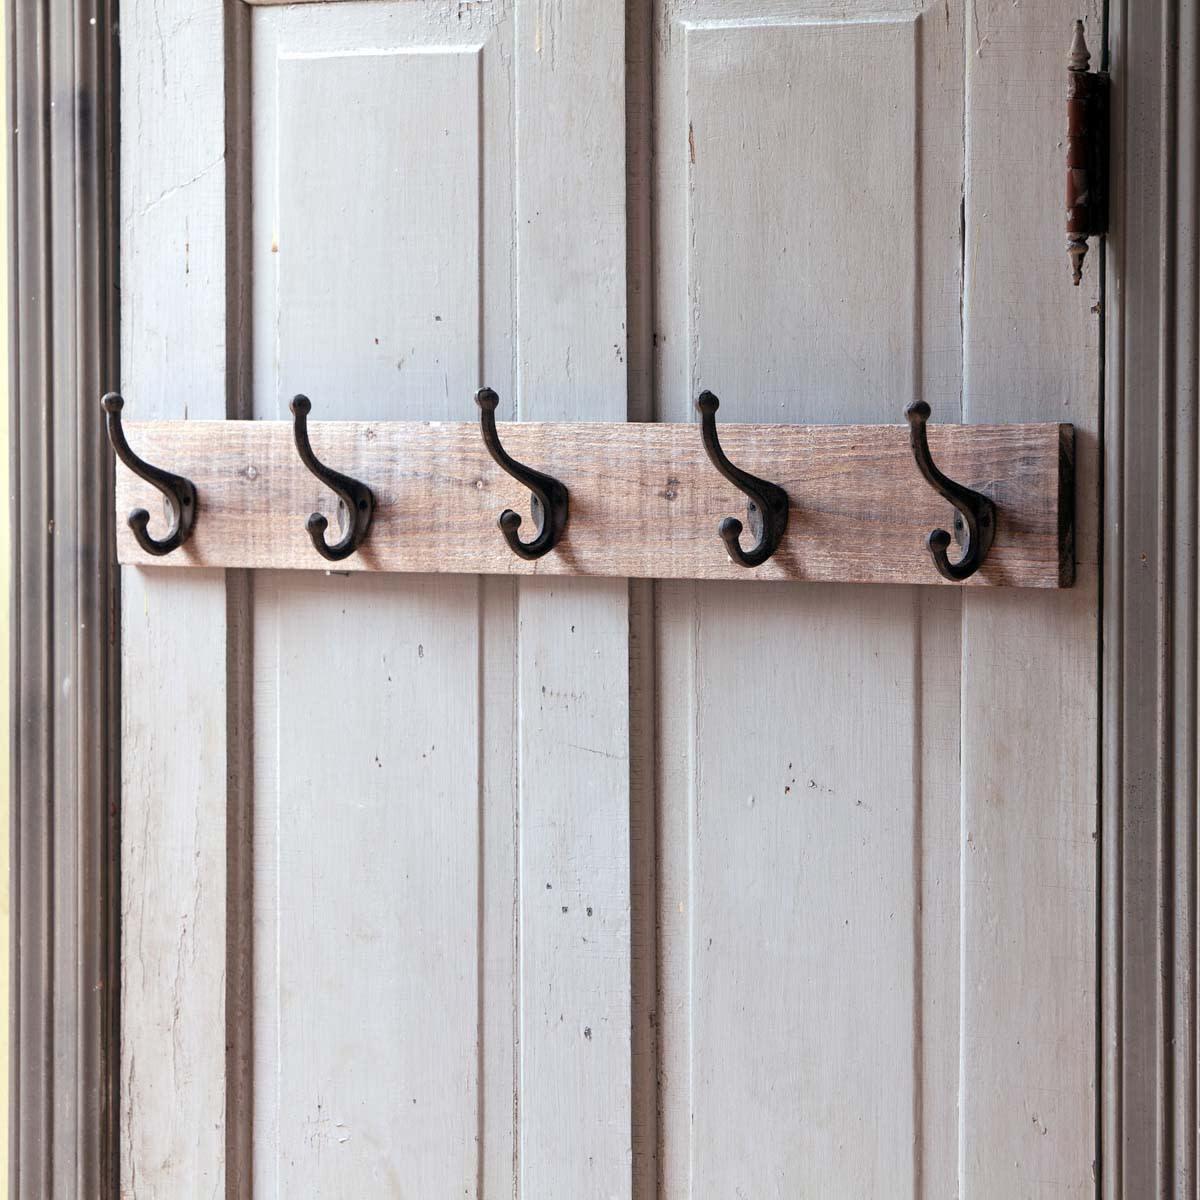 30 rustic reclaimed wood coat rack